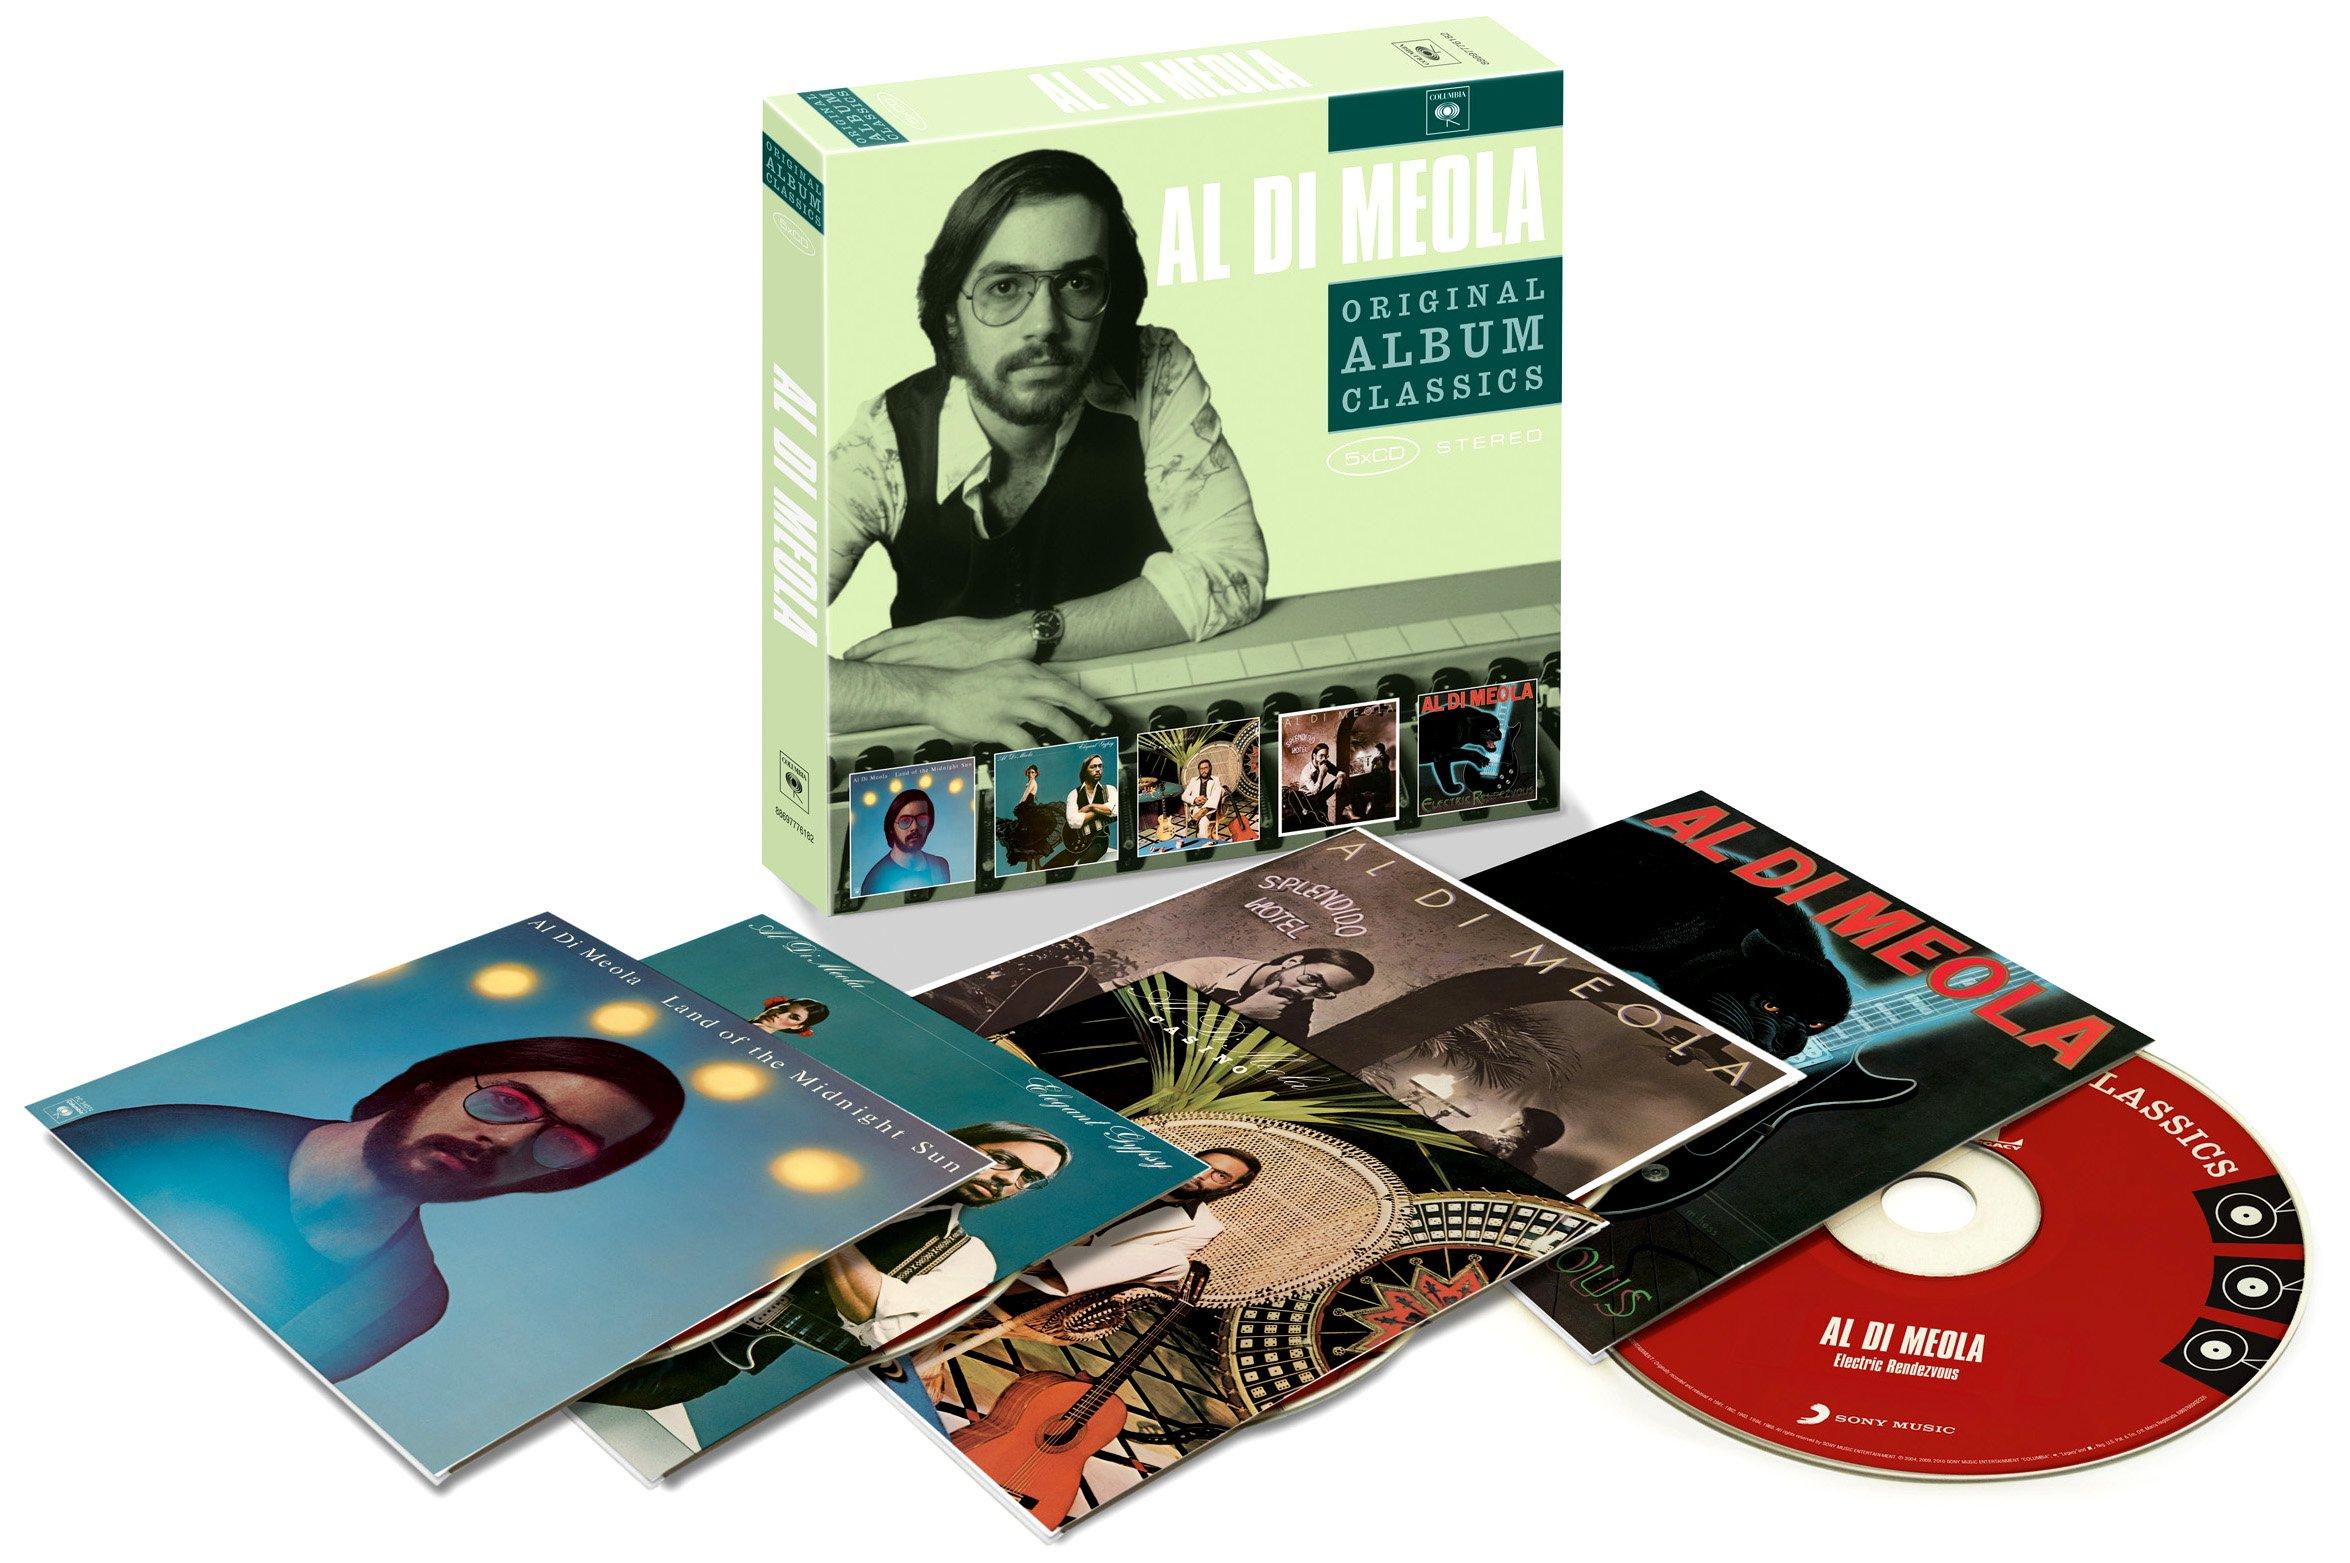 5cd Original Album Classics (Land Of The Midnight Sun/Elegant Gypsy/Casi No/Splendido Hotel/Electric Rendezvo Us) by SONY MUSIC ENTERTAIN